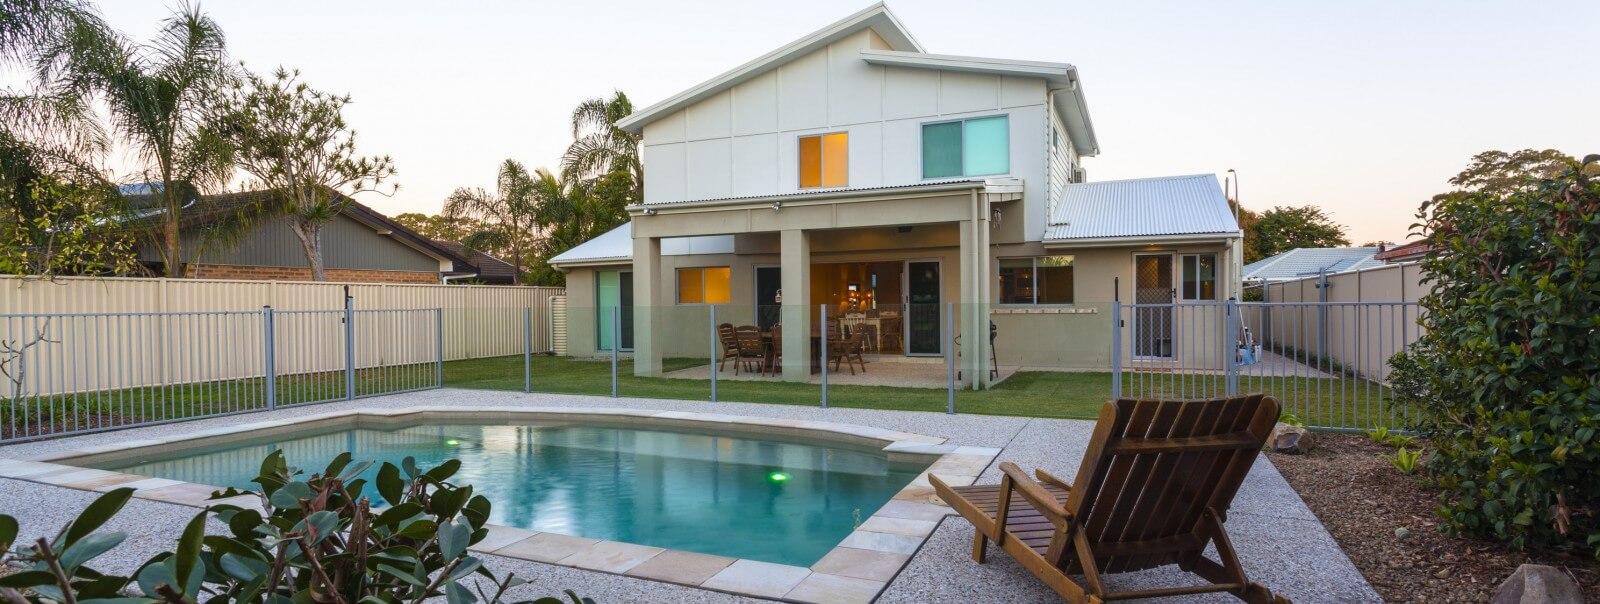 beautiful-house-with-pool-e1446674451323